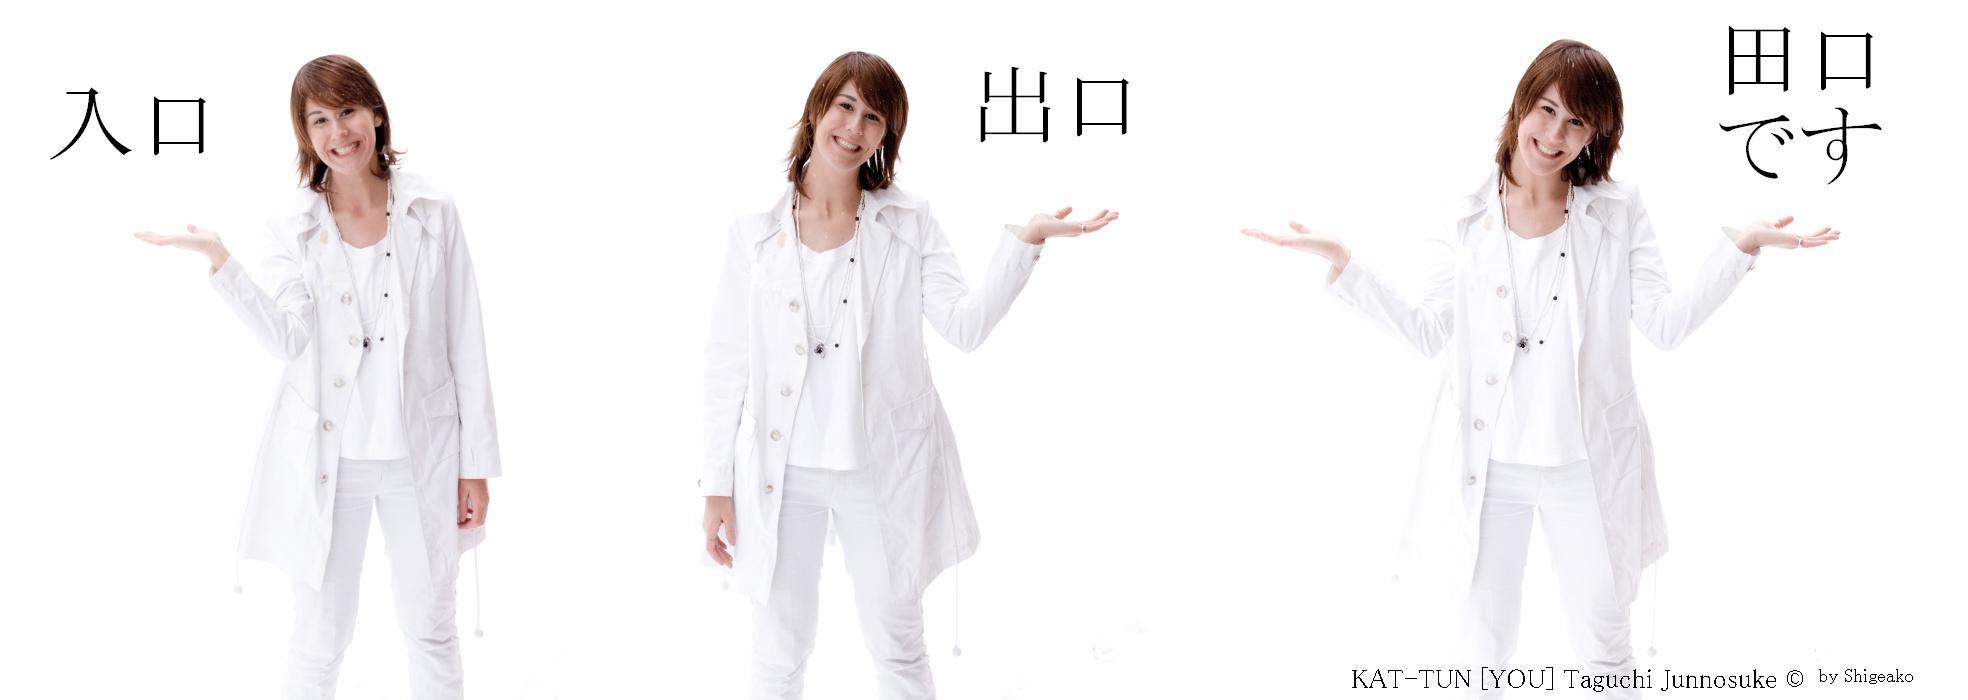 KAT-TUN: Taguchi desu by Shigeako